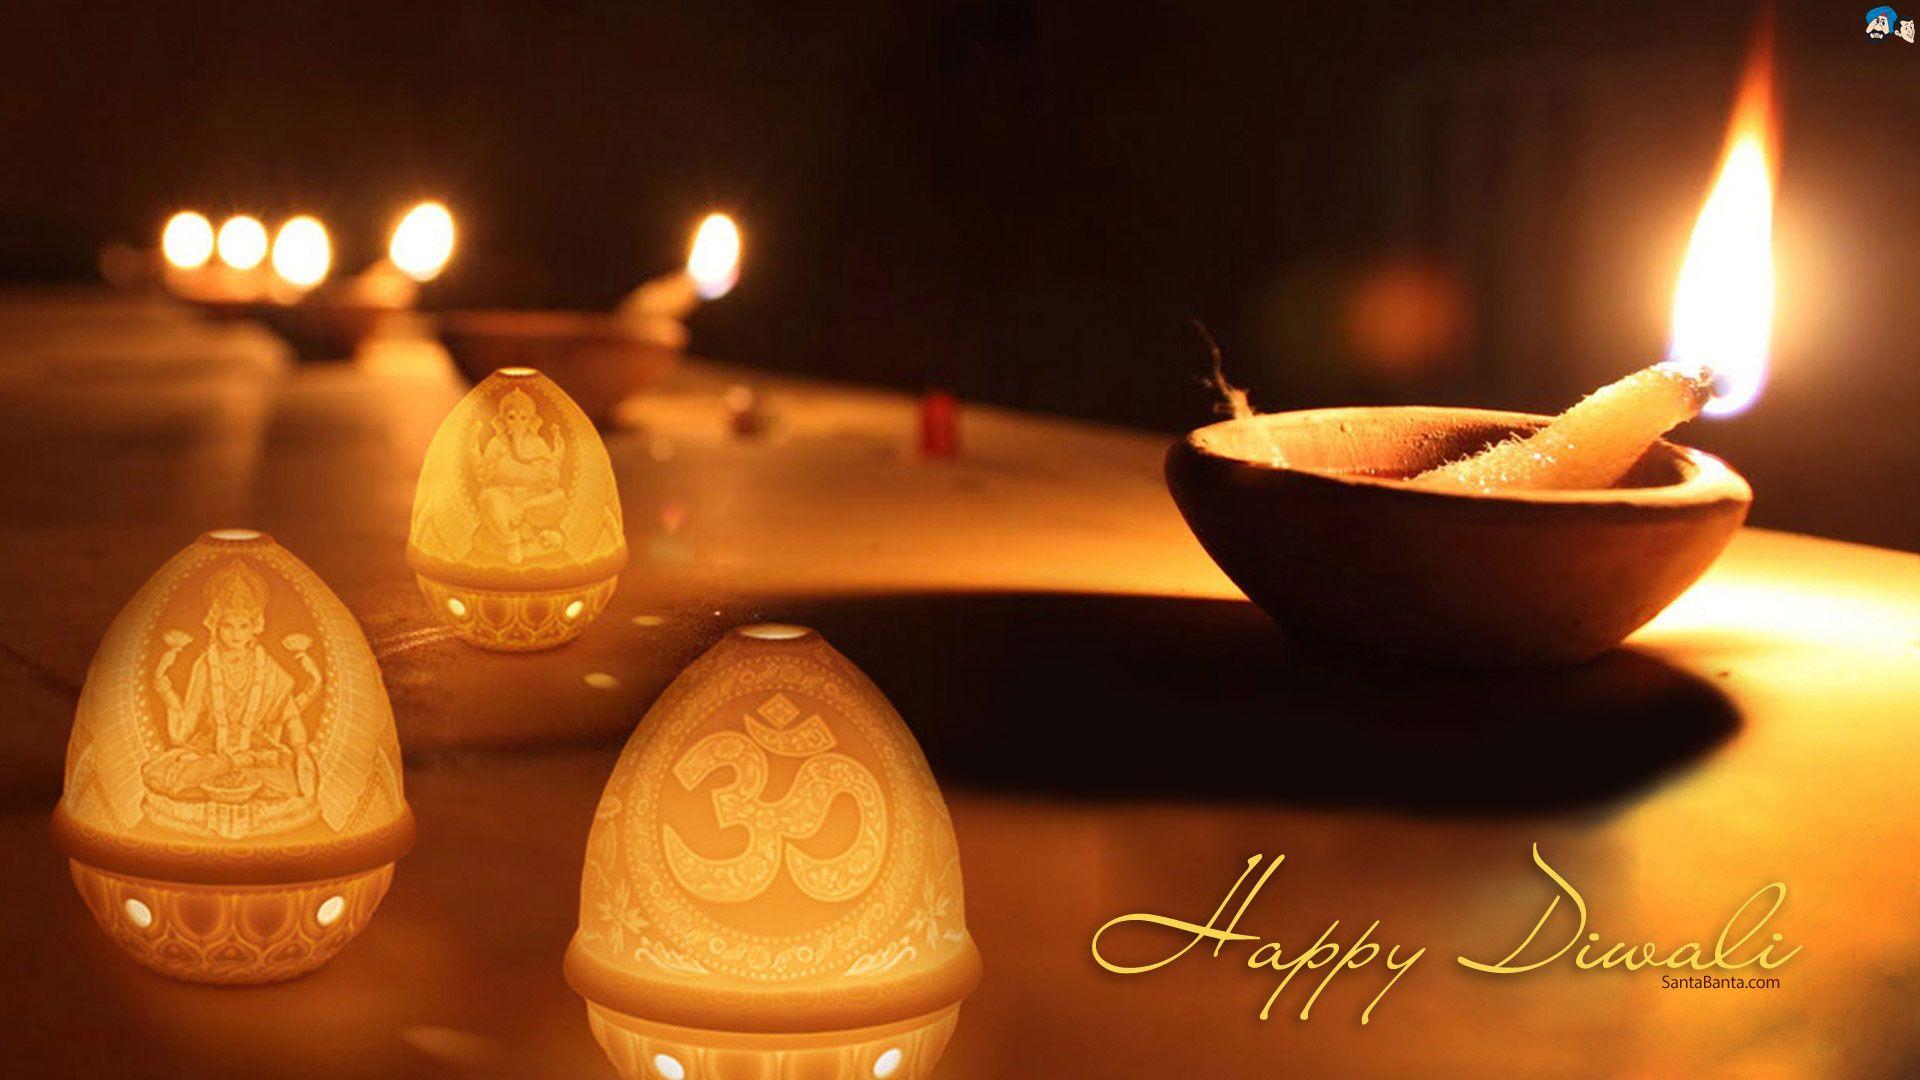 Santabanta Diwali Hd Wallpaper Free Download - Happy Diwali & Prosperous New Year , HD Wallpaper & Backgrounds